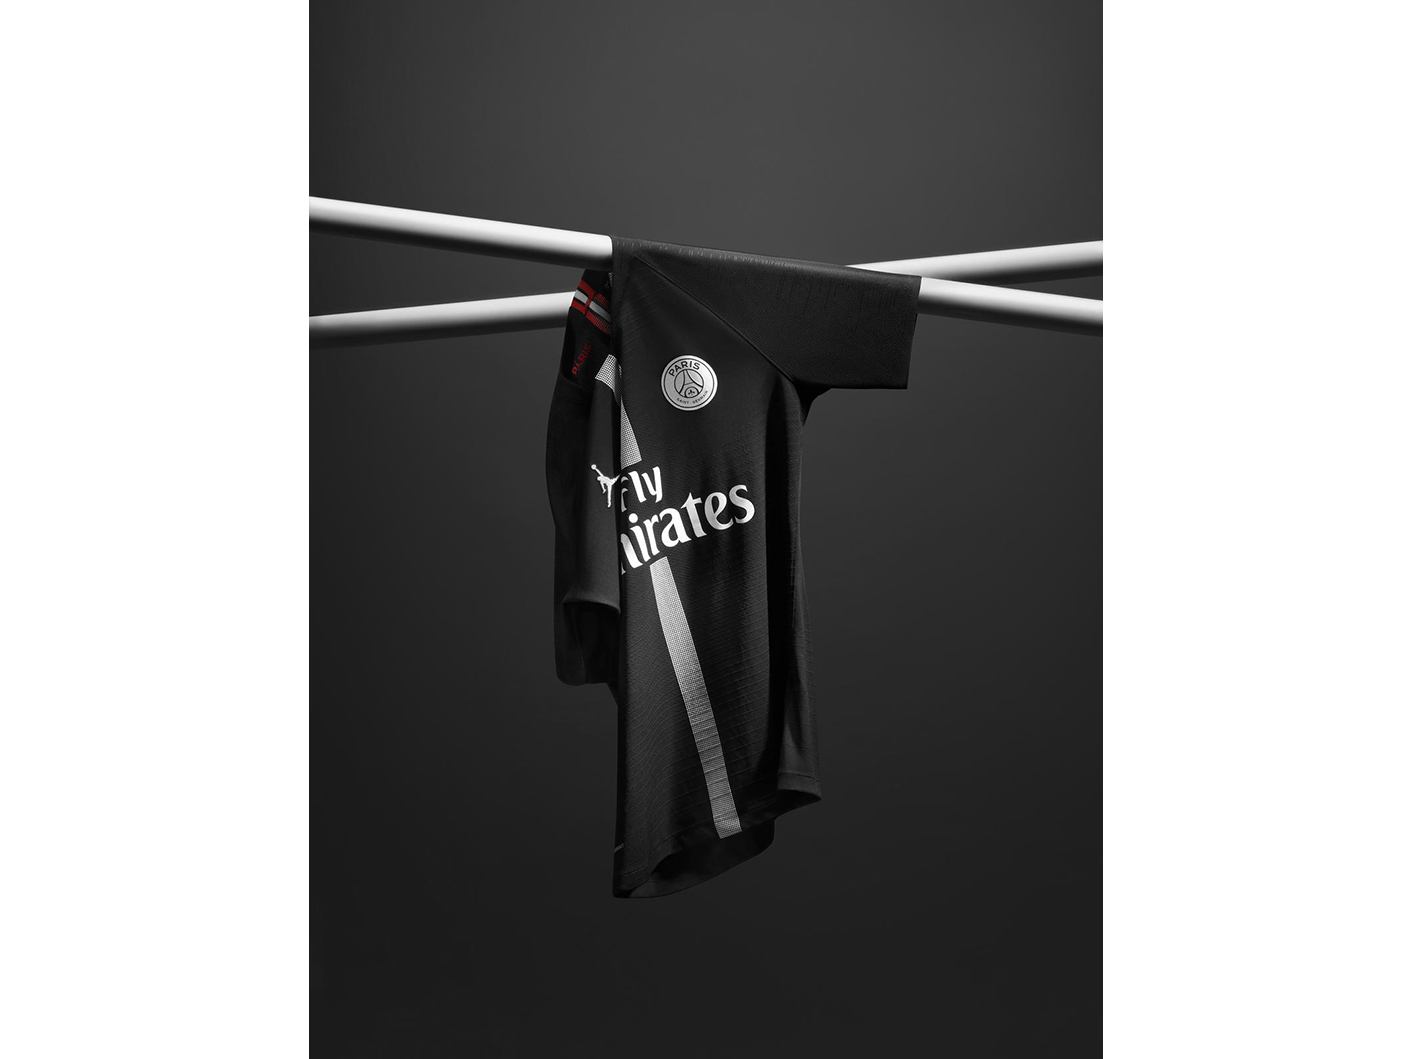 Jordan_Brand__Paris_Saint-Germain_as_its_First-Ever_Football_Club_Soccer_28_81739